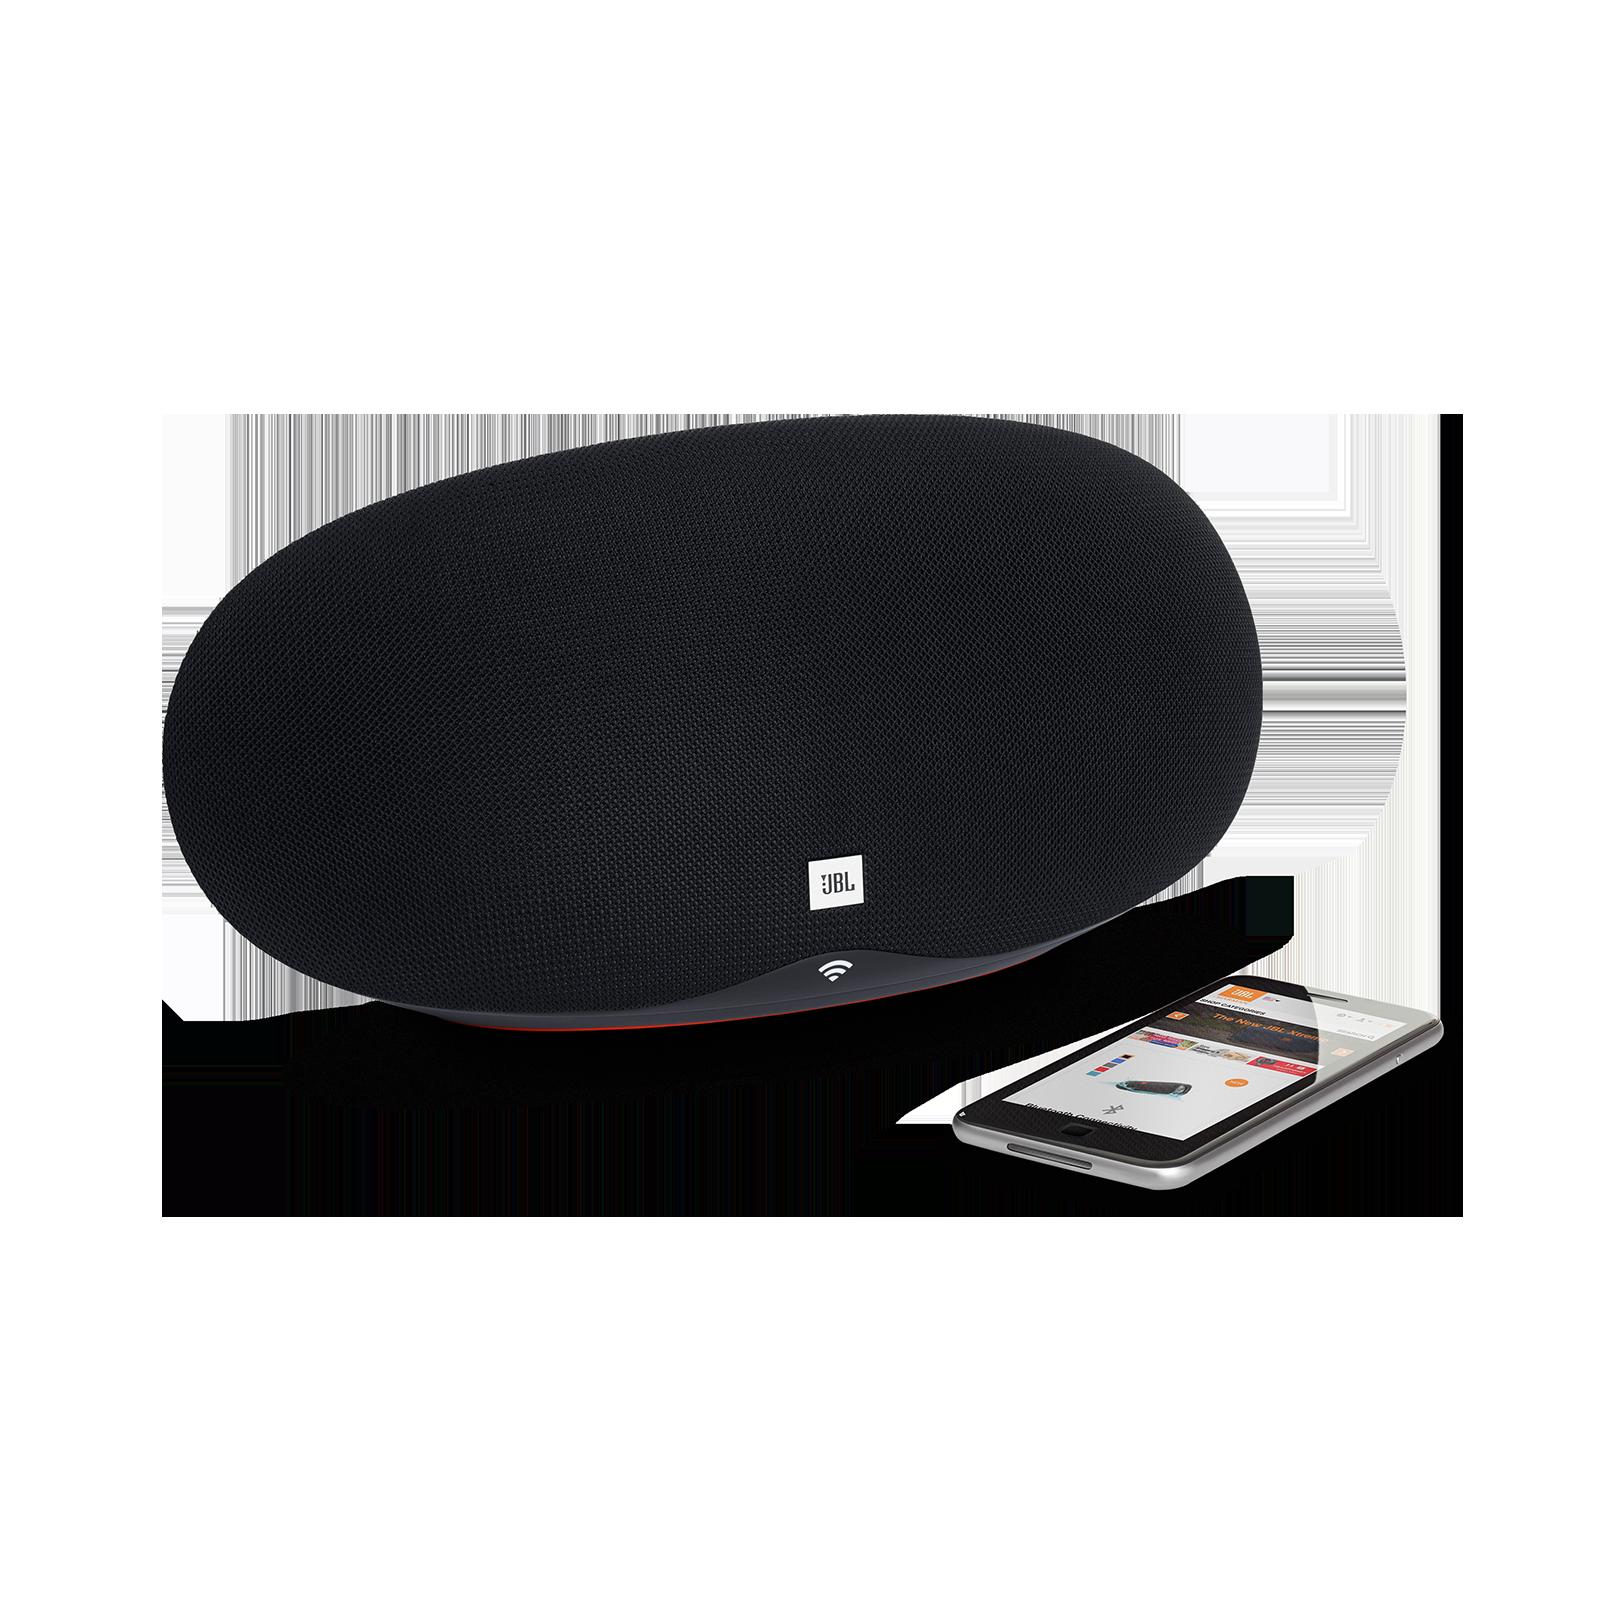 JBL Playlist - Black - Wireless speaker with Chromecast built-in - Detailshot 1